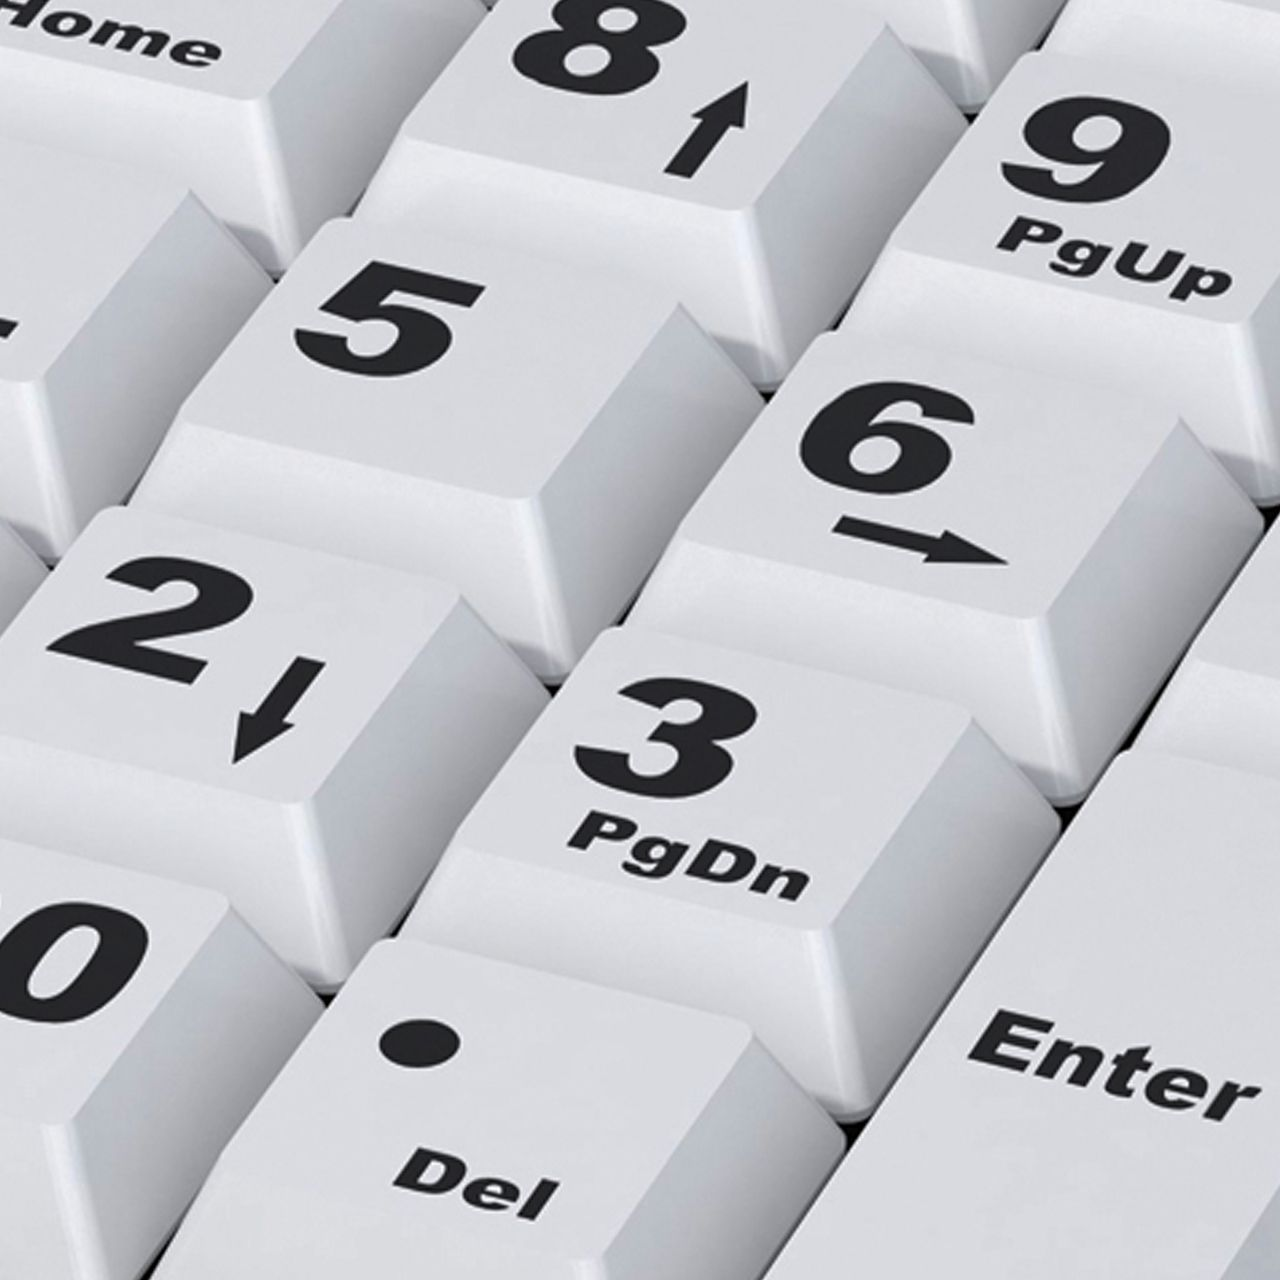 big keys keyboard hulpmiddelen slechtzienden ERKABKE101 Voorkant zoom